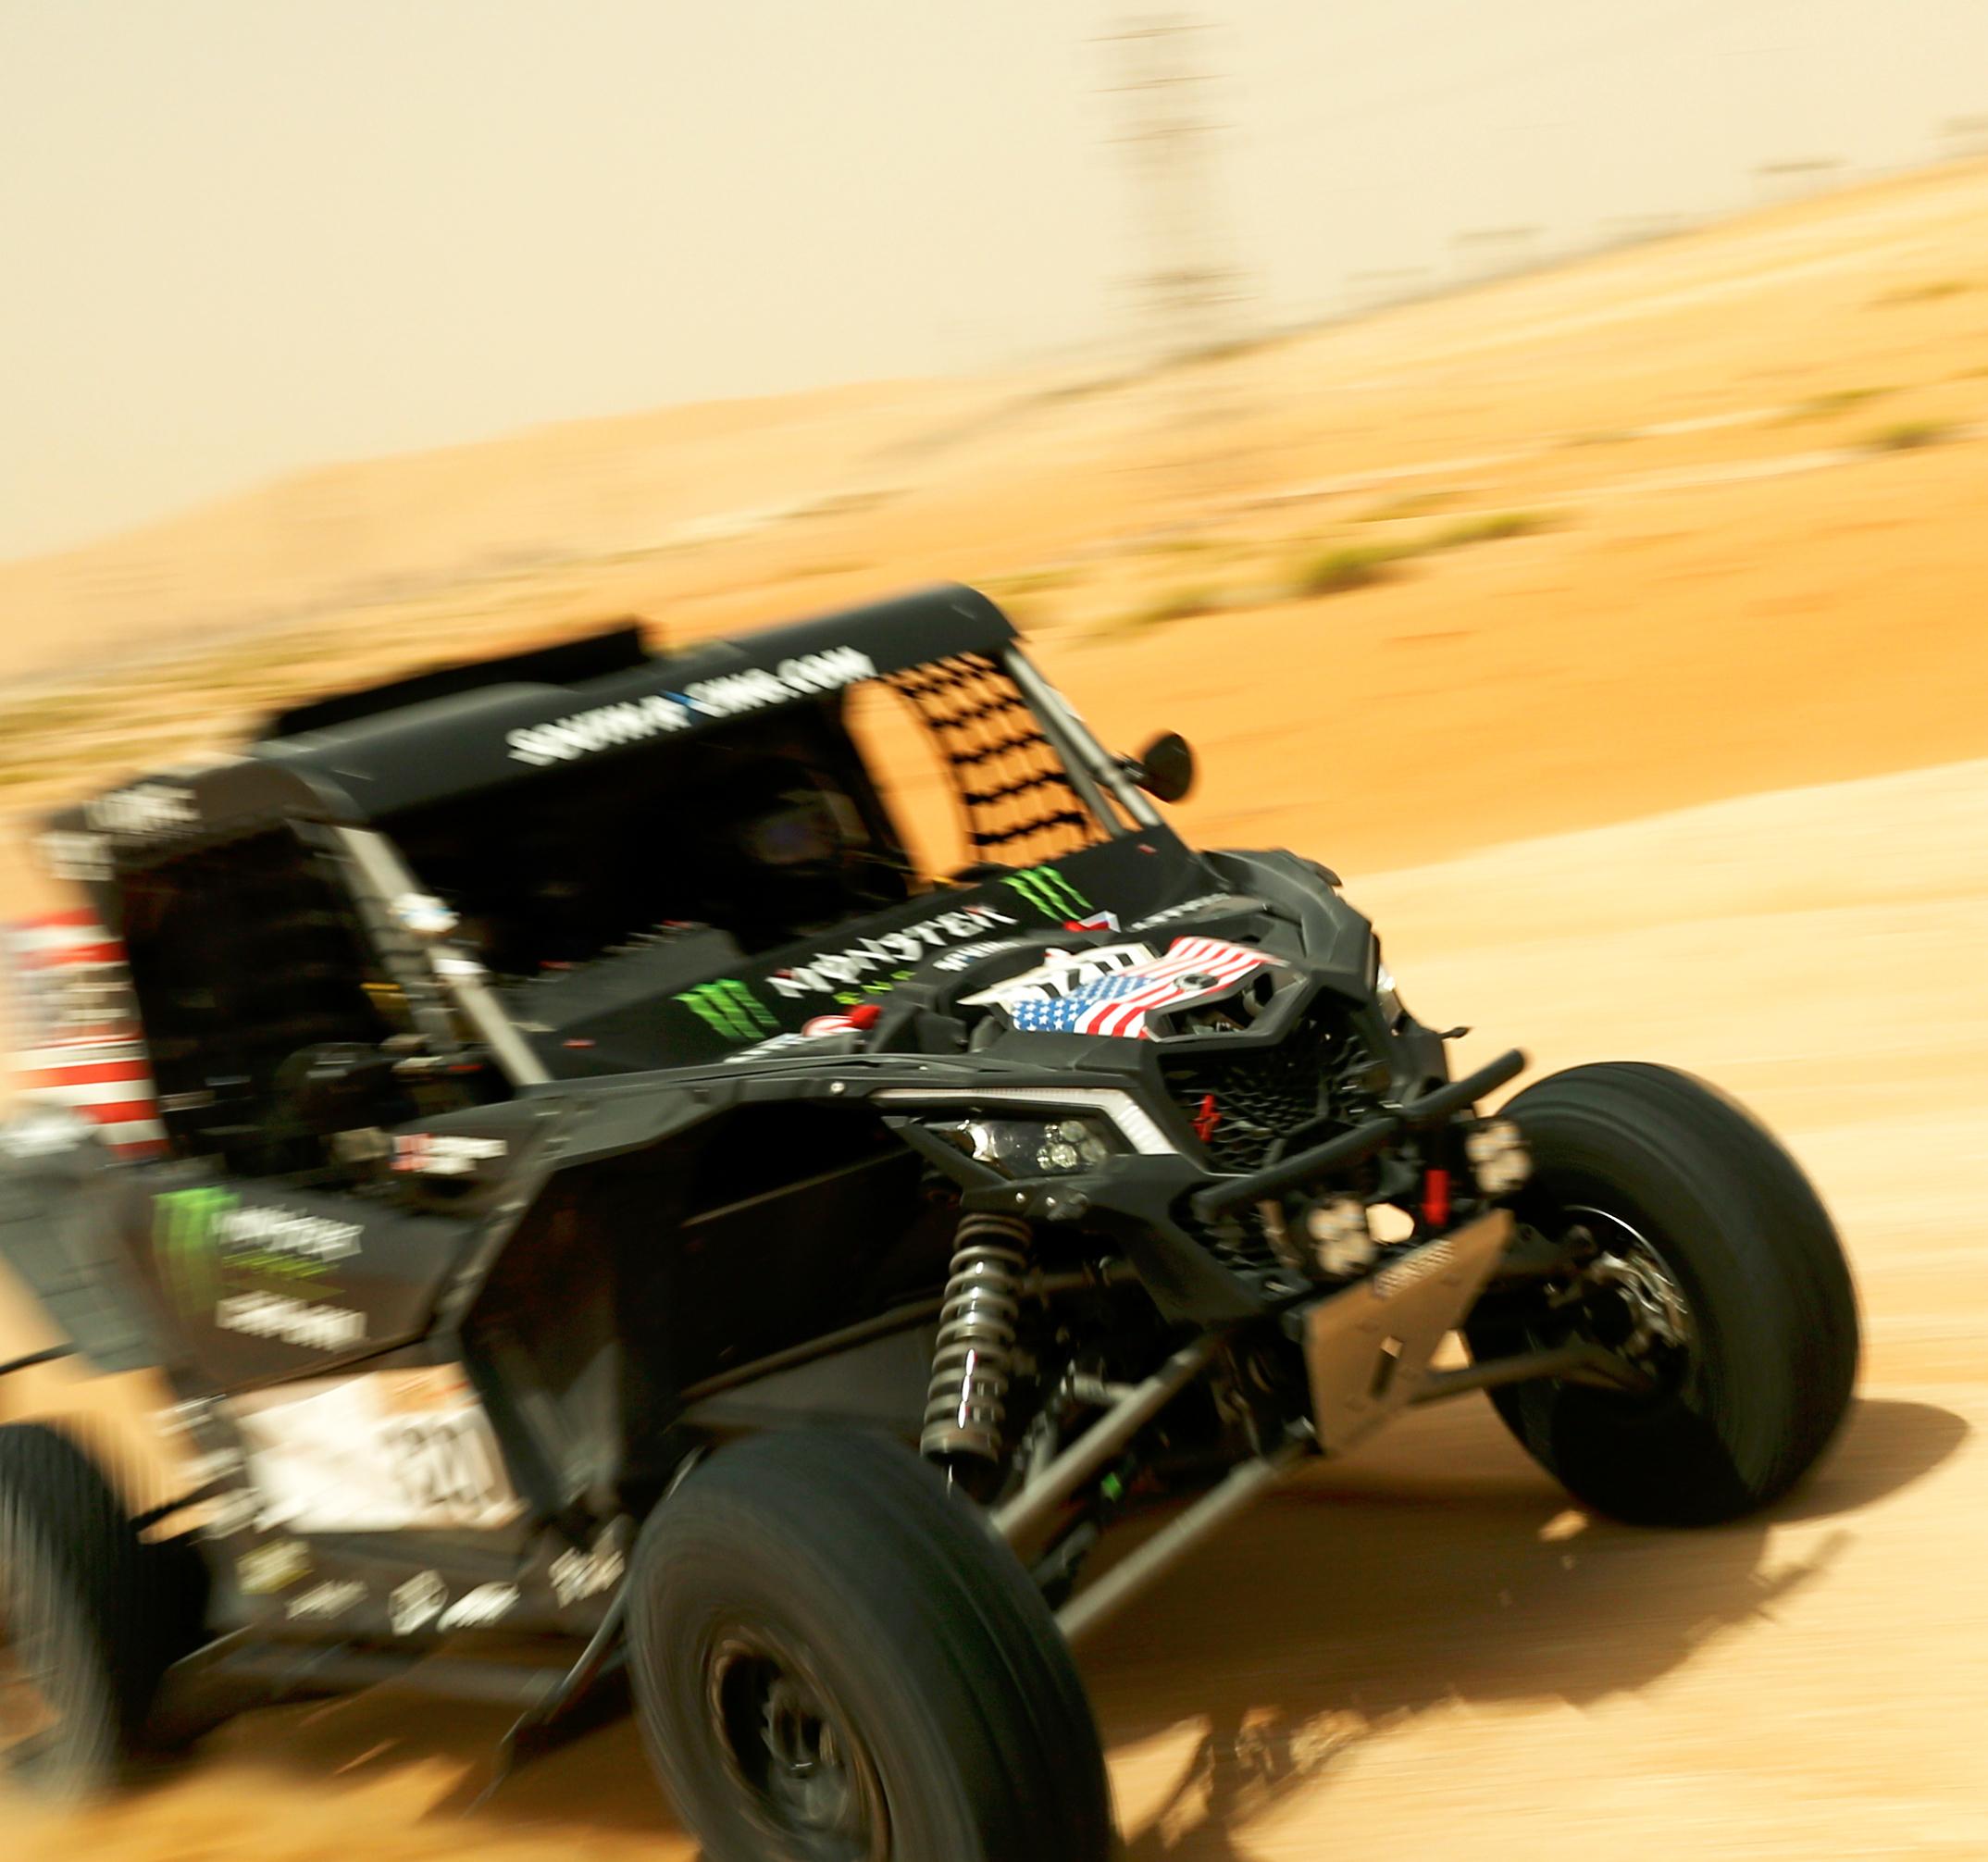 CaseyCurrie_AbuDhabiDesertChallenge_Rally_ Stage2_CanAm_005.jpg